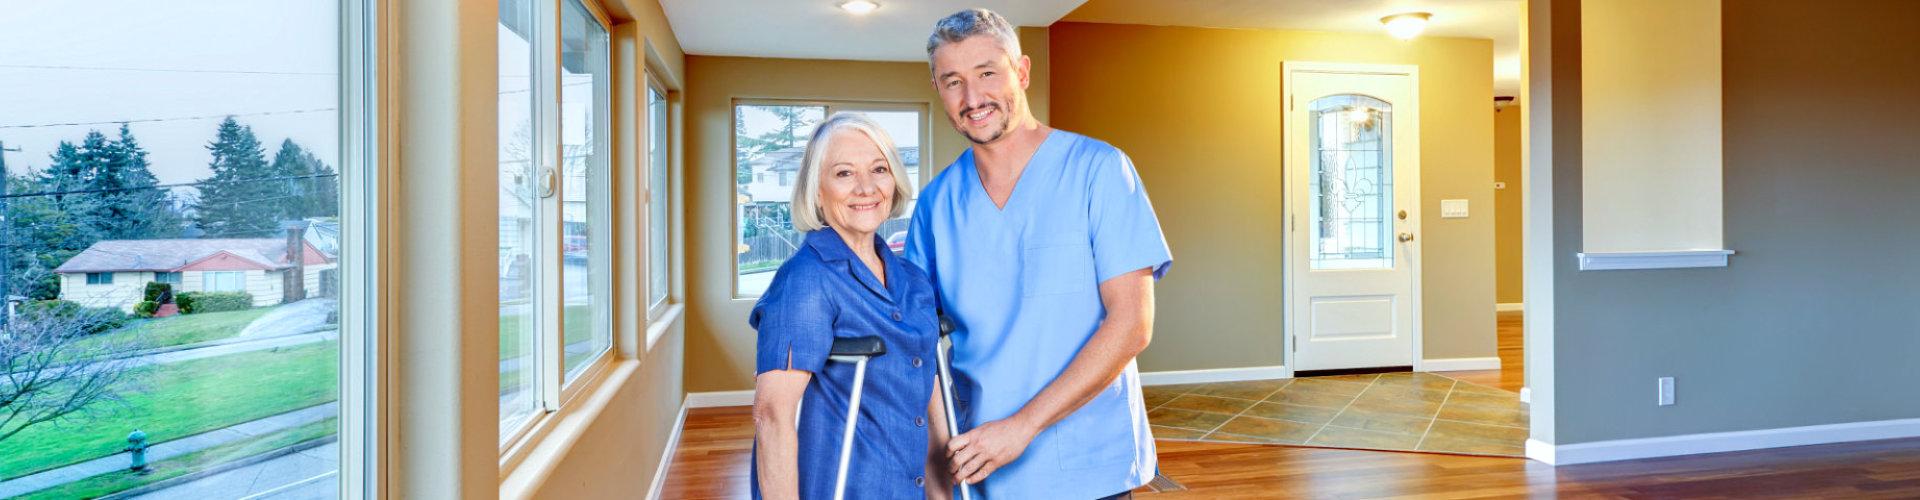 nurse with patient smiling